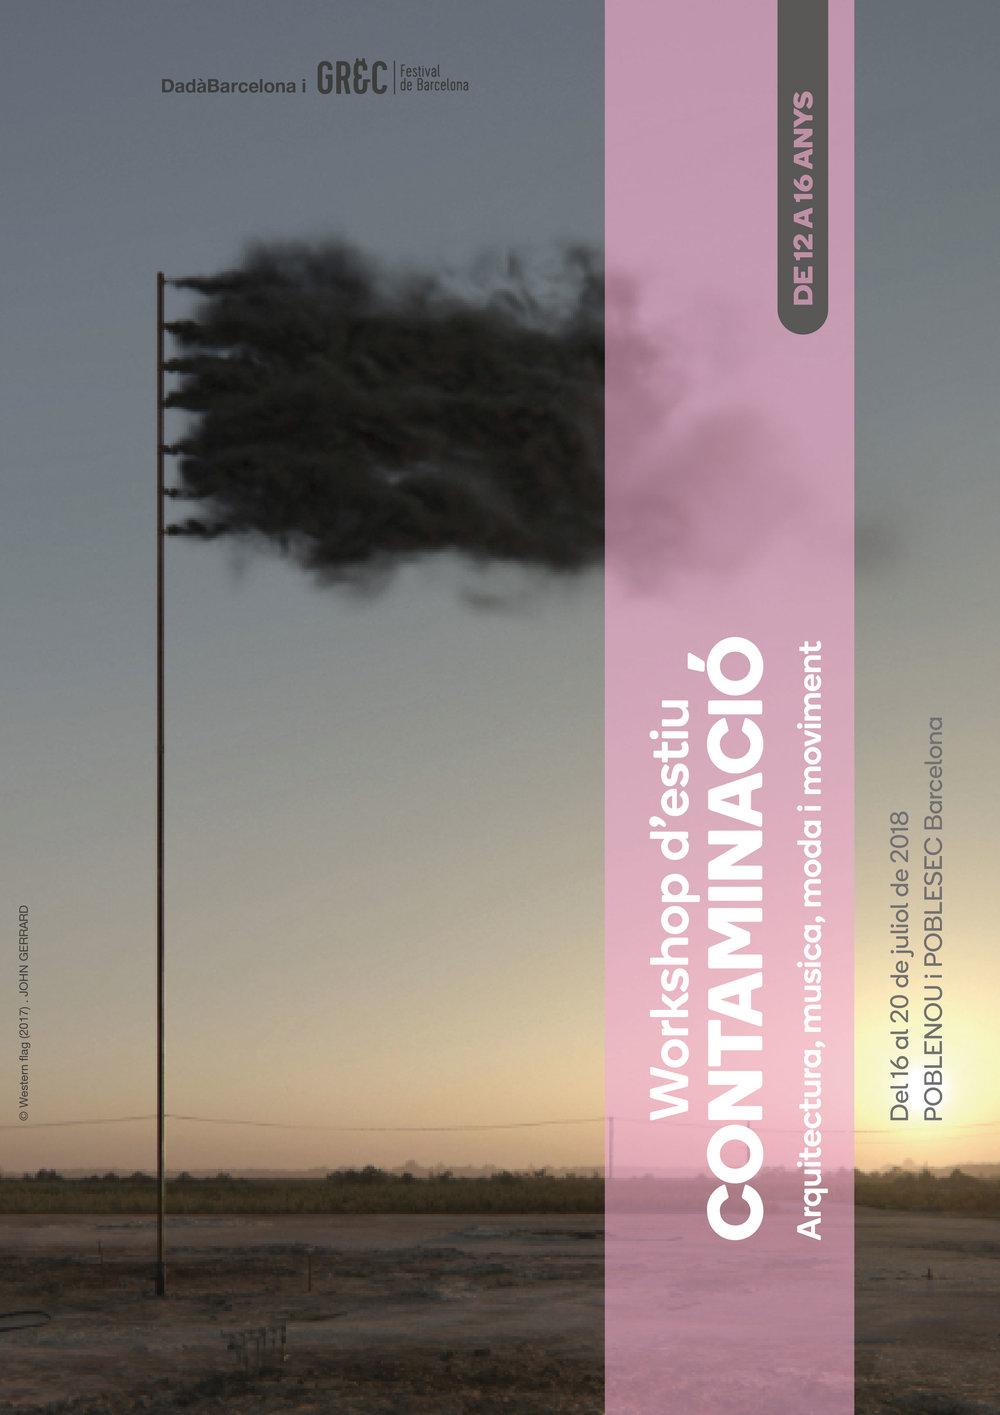 Contaminació_Cartell_nit-01.jpg